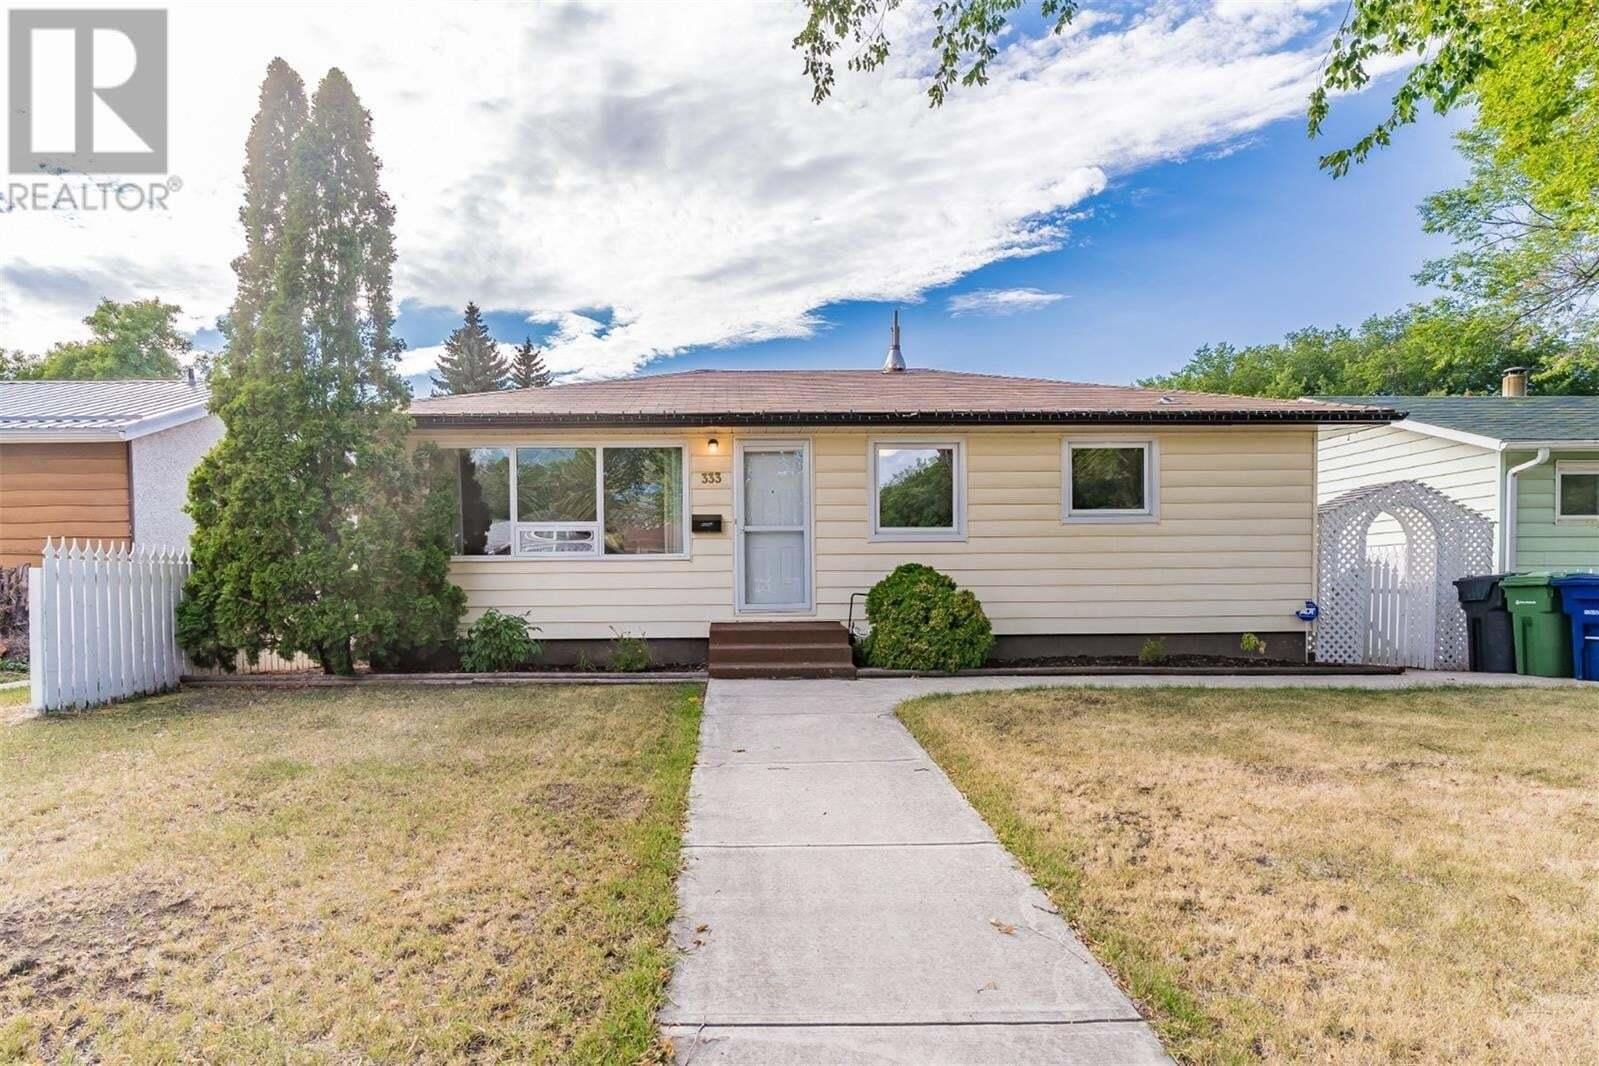 House for sale at 333 Witney Ave N Saskatoon Saskatchewan - MLS: SK826499